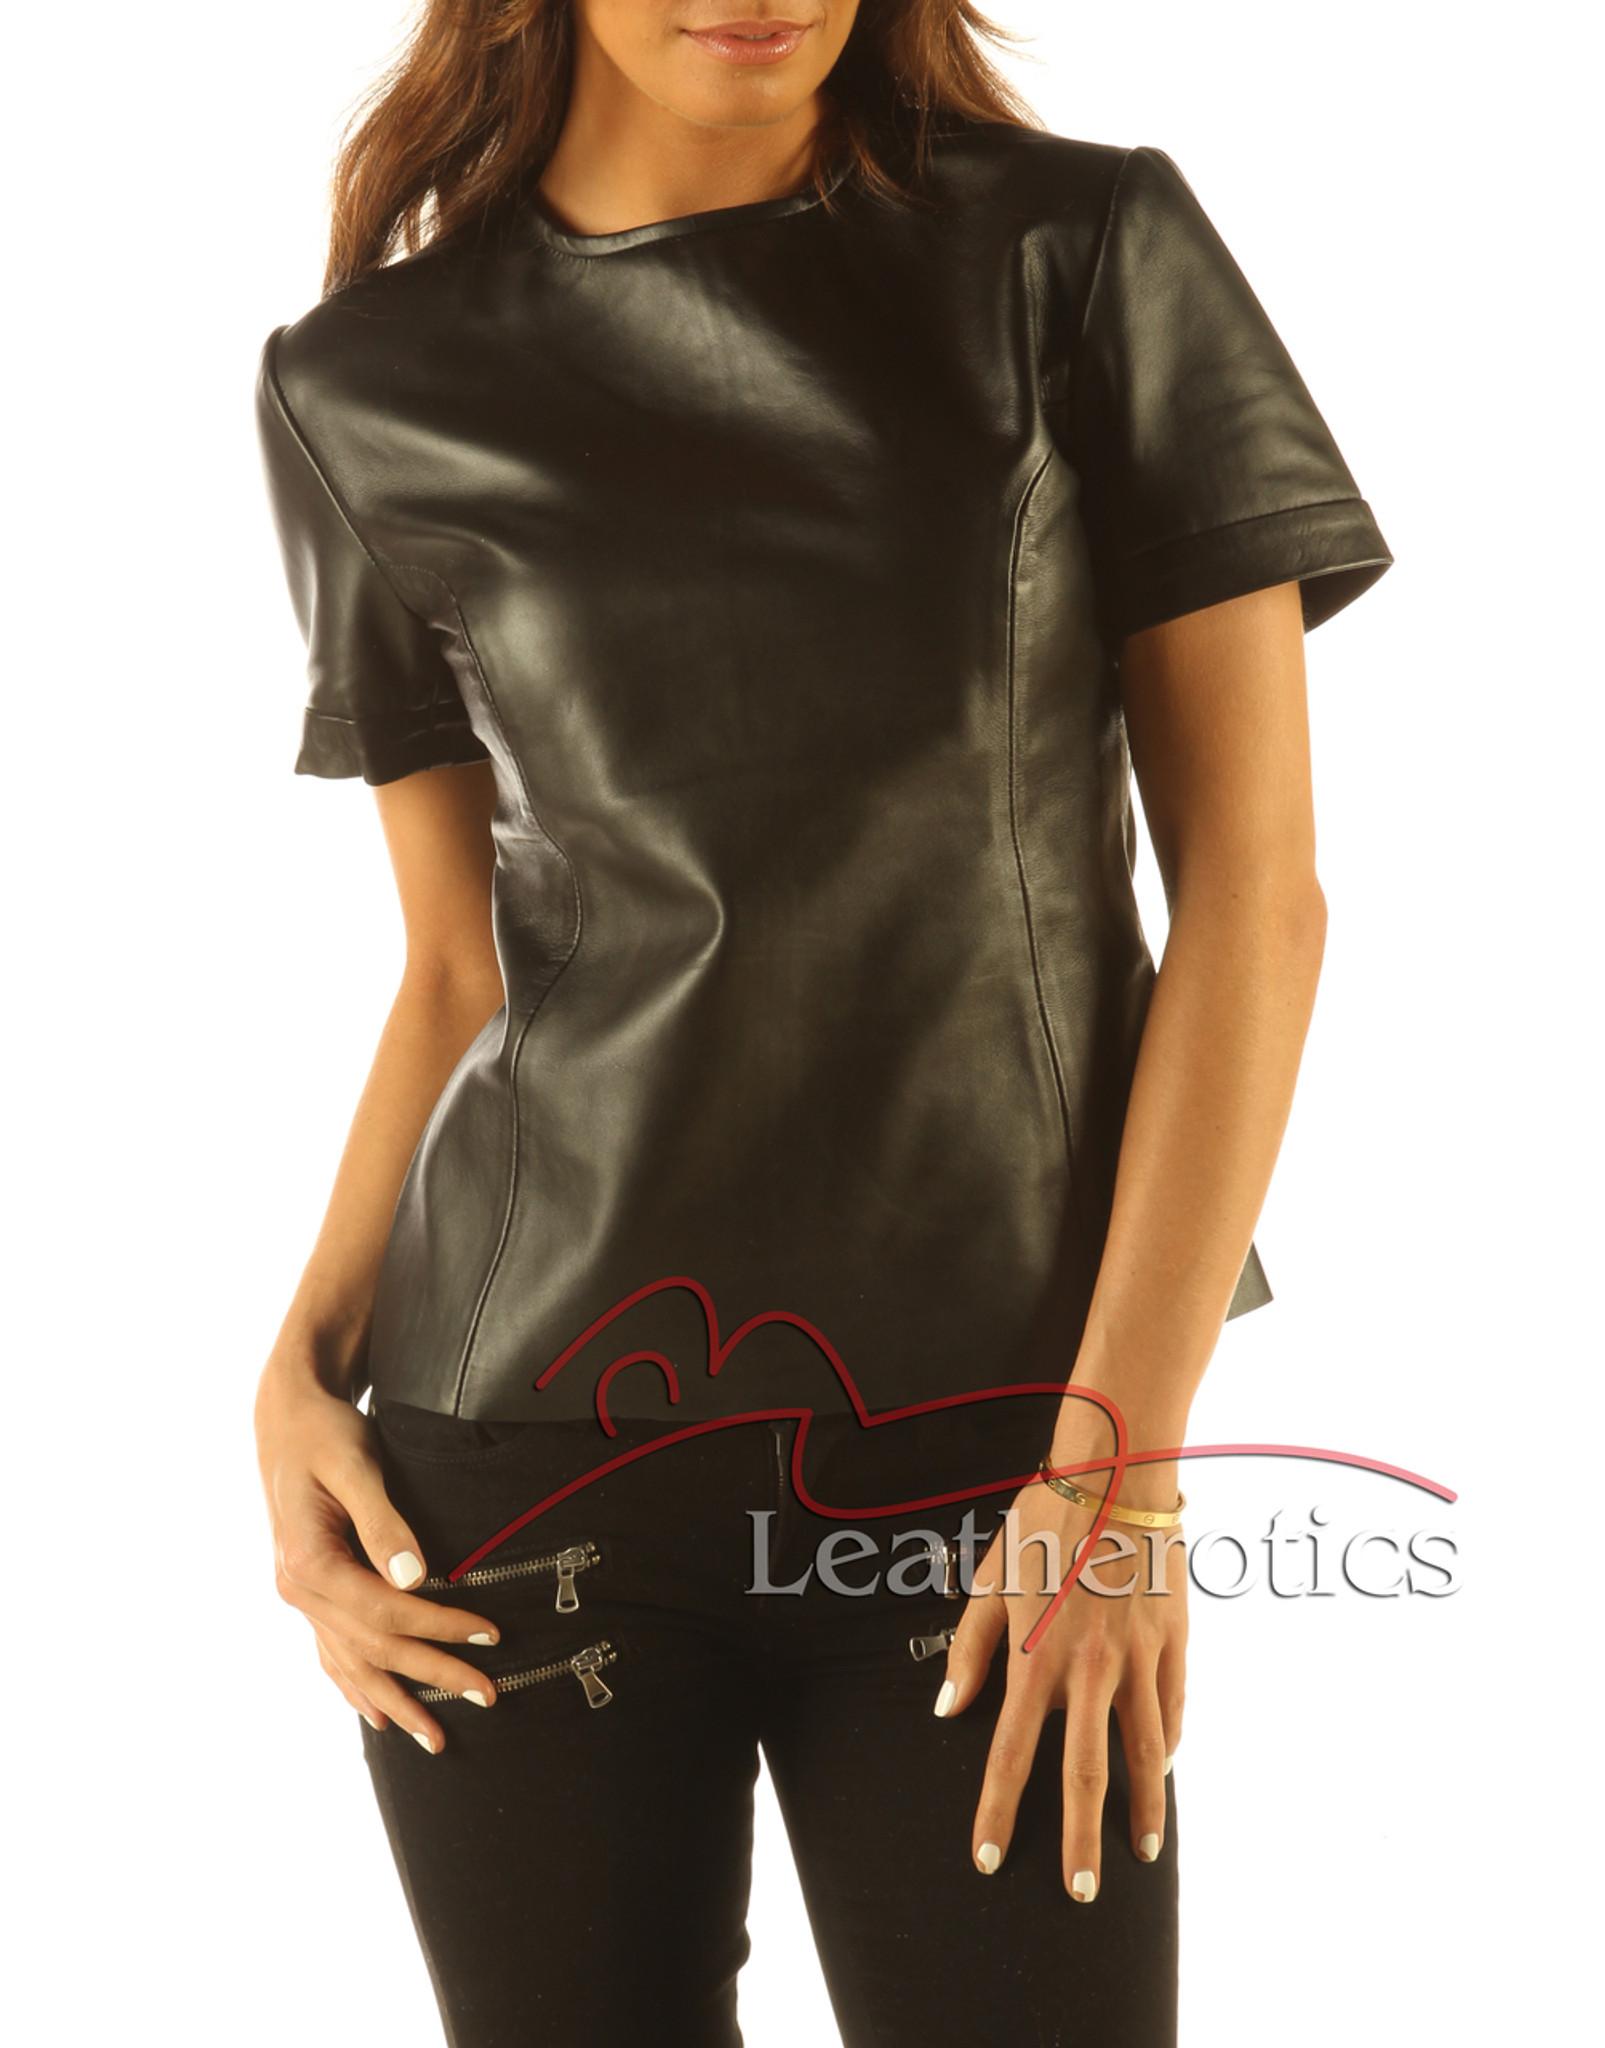 4441242fcf ... Full Grain Leather T-Shirt Light Top Celebrity T-shirt Vest With Zip  Back ...